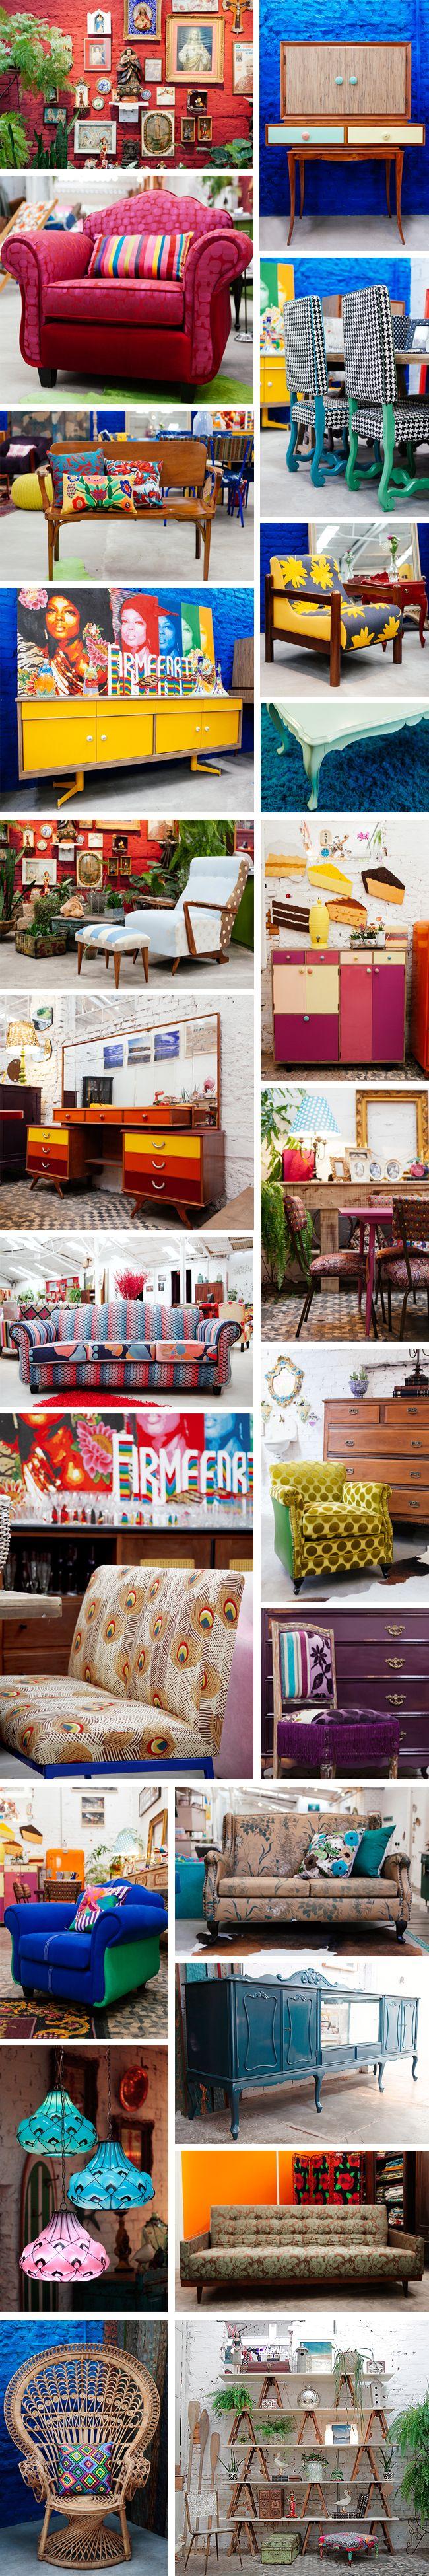 1023 best furniture images on Pinterest